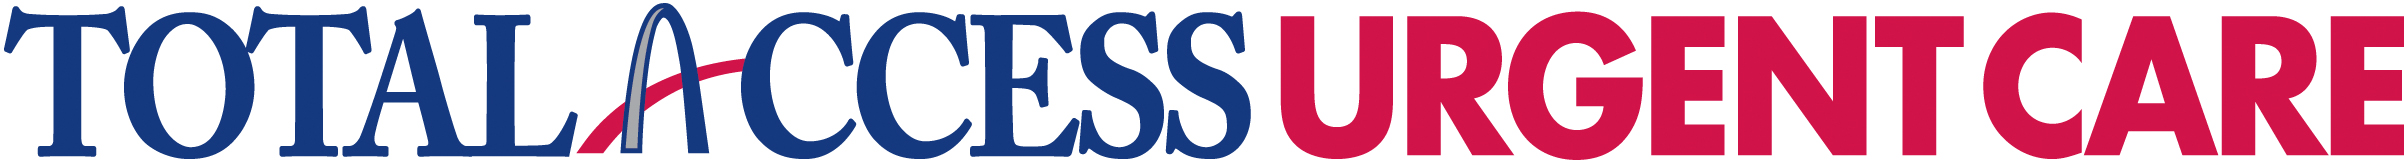 Tauc sign logo horizontal